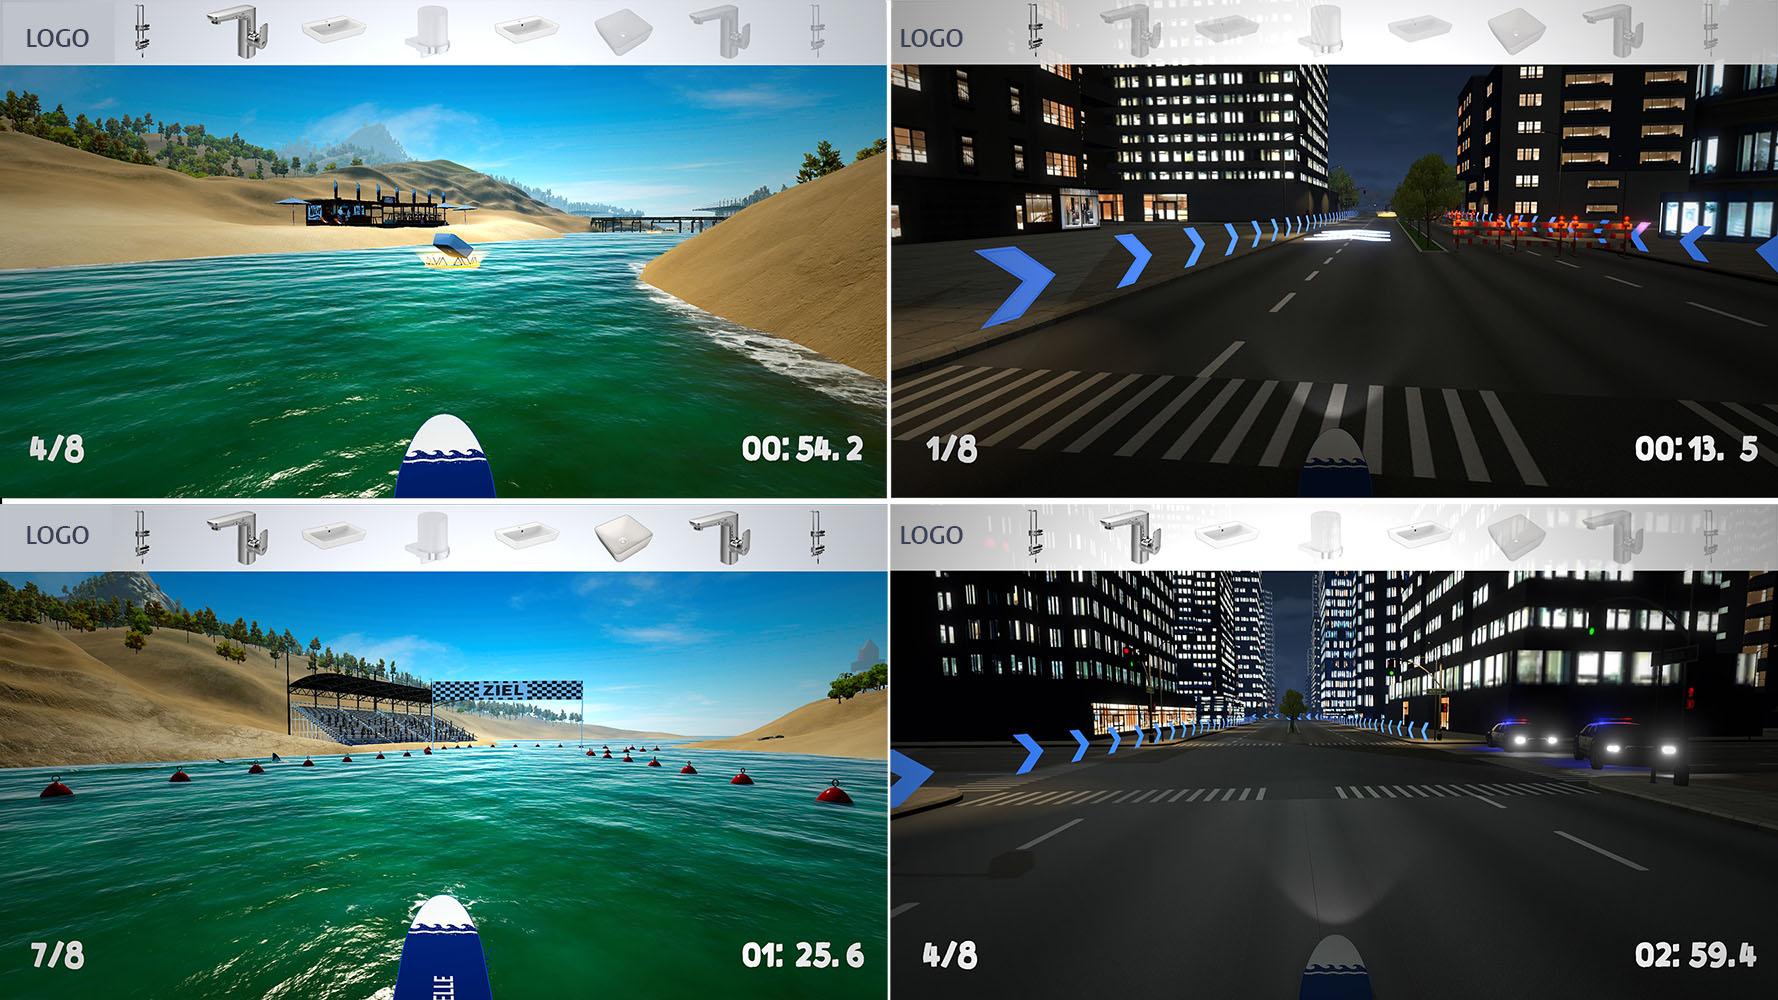 tecmotion - Corporate Games CityBoard (rechts) und SurfBoard (links)- Spielausschnitte 1